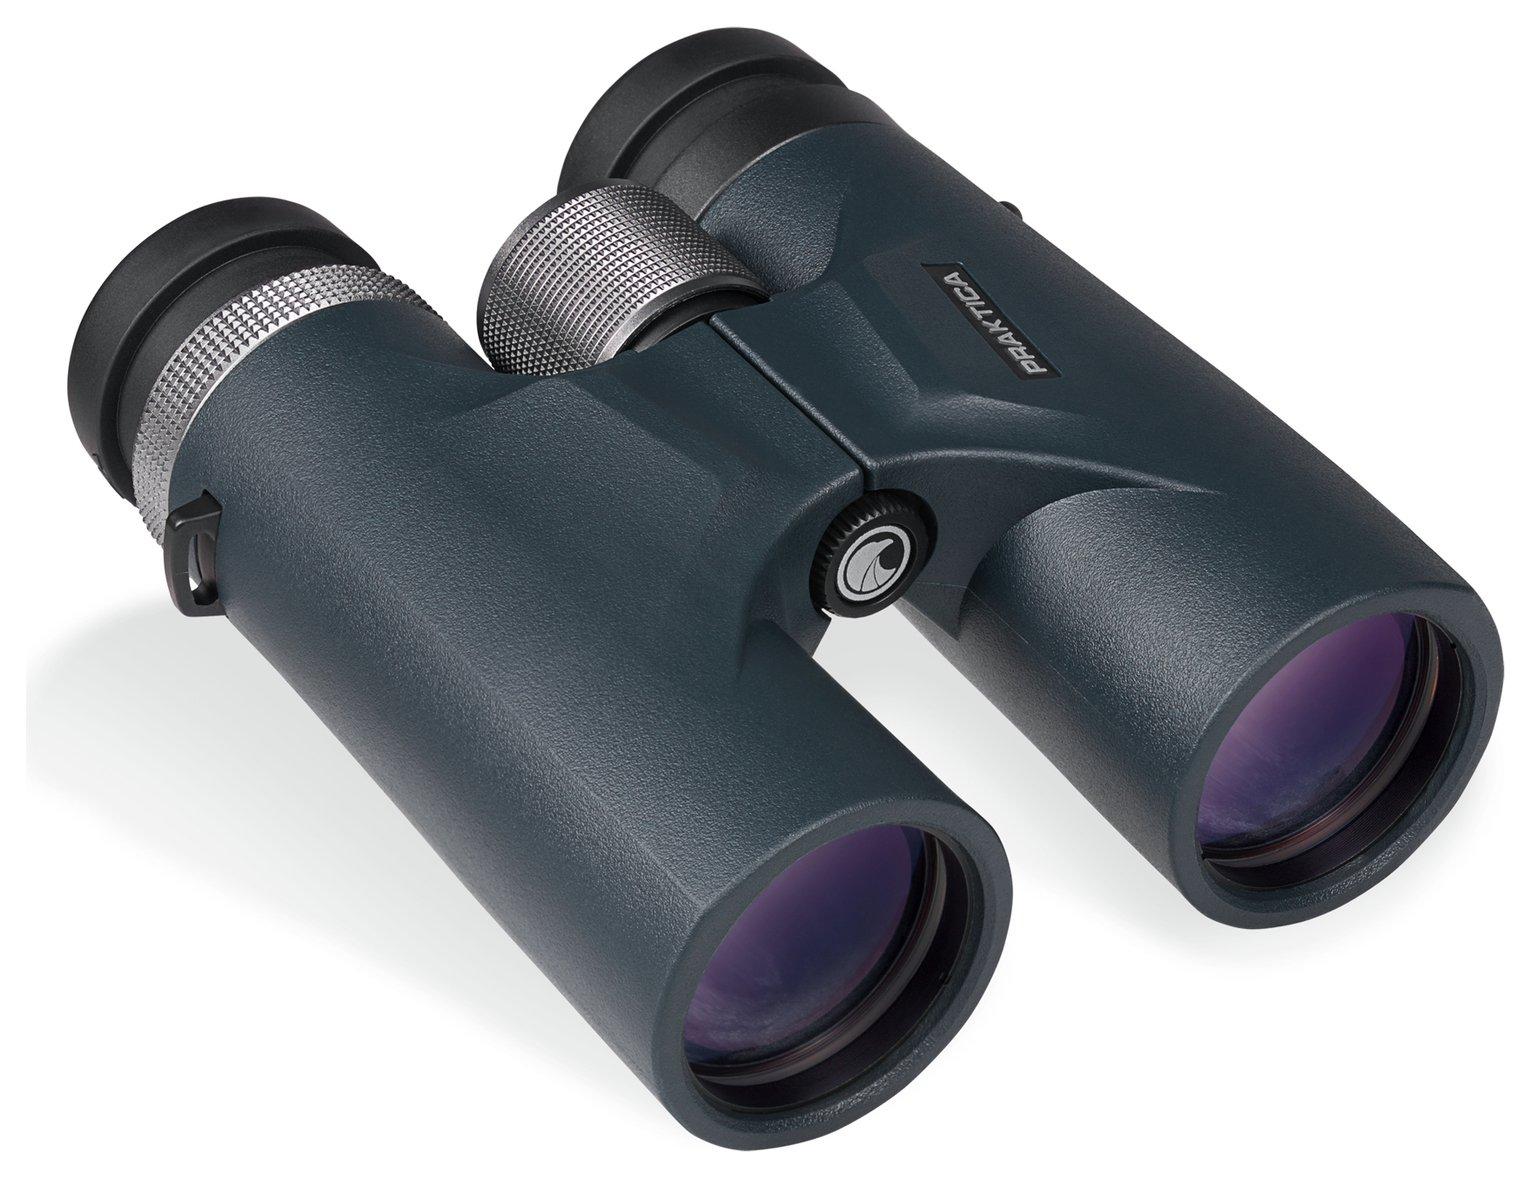 Praktica - Binoculars - 8x42mm Waterproof